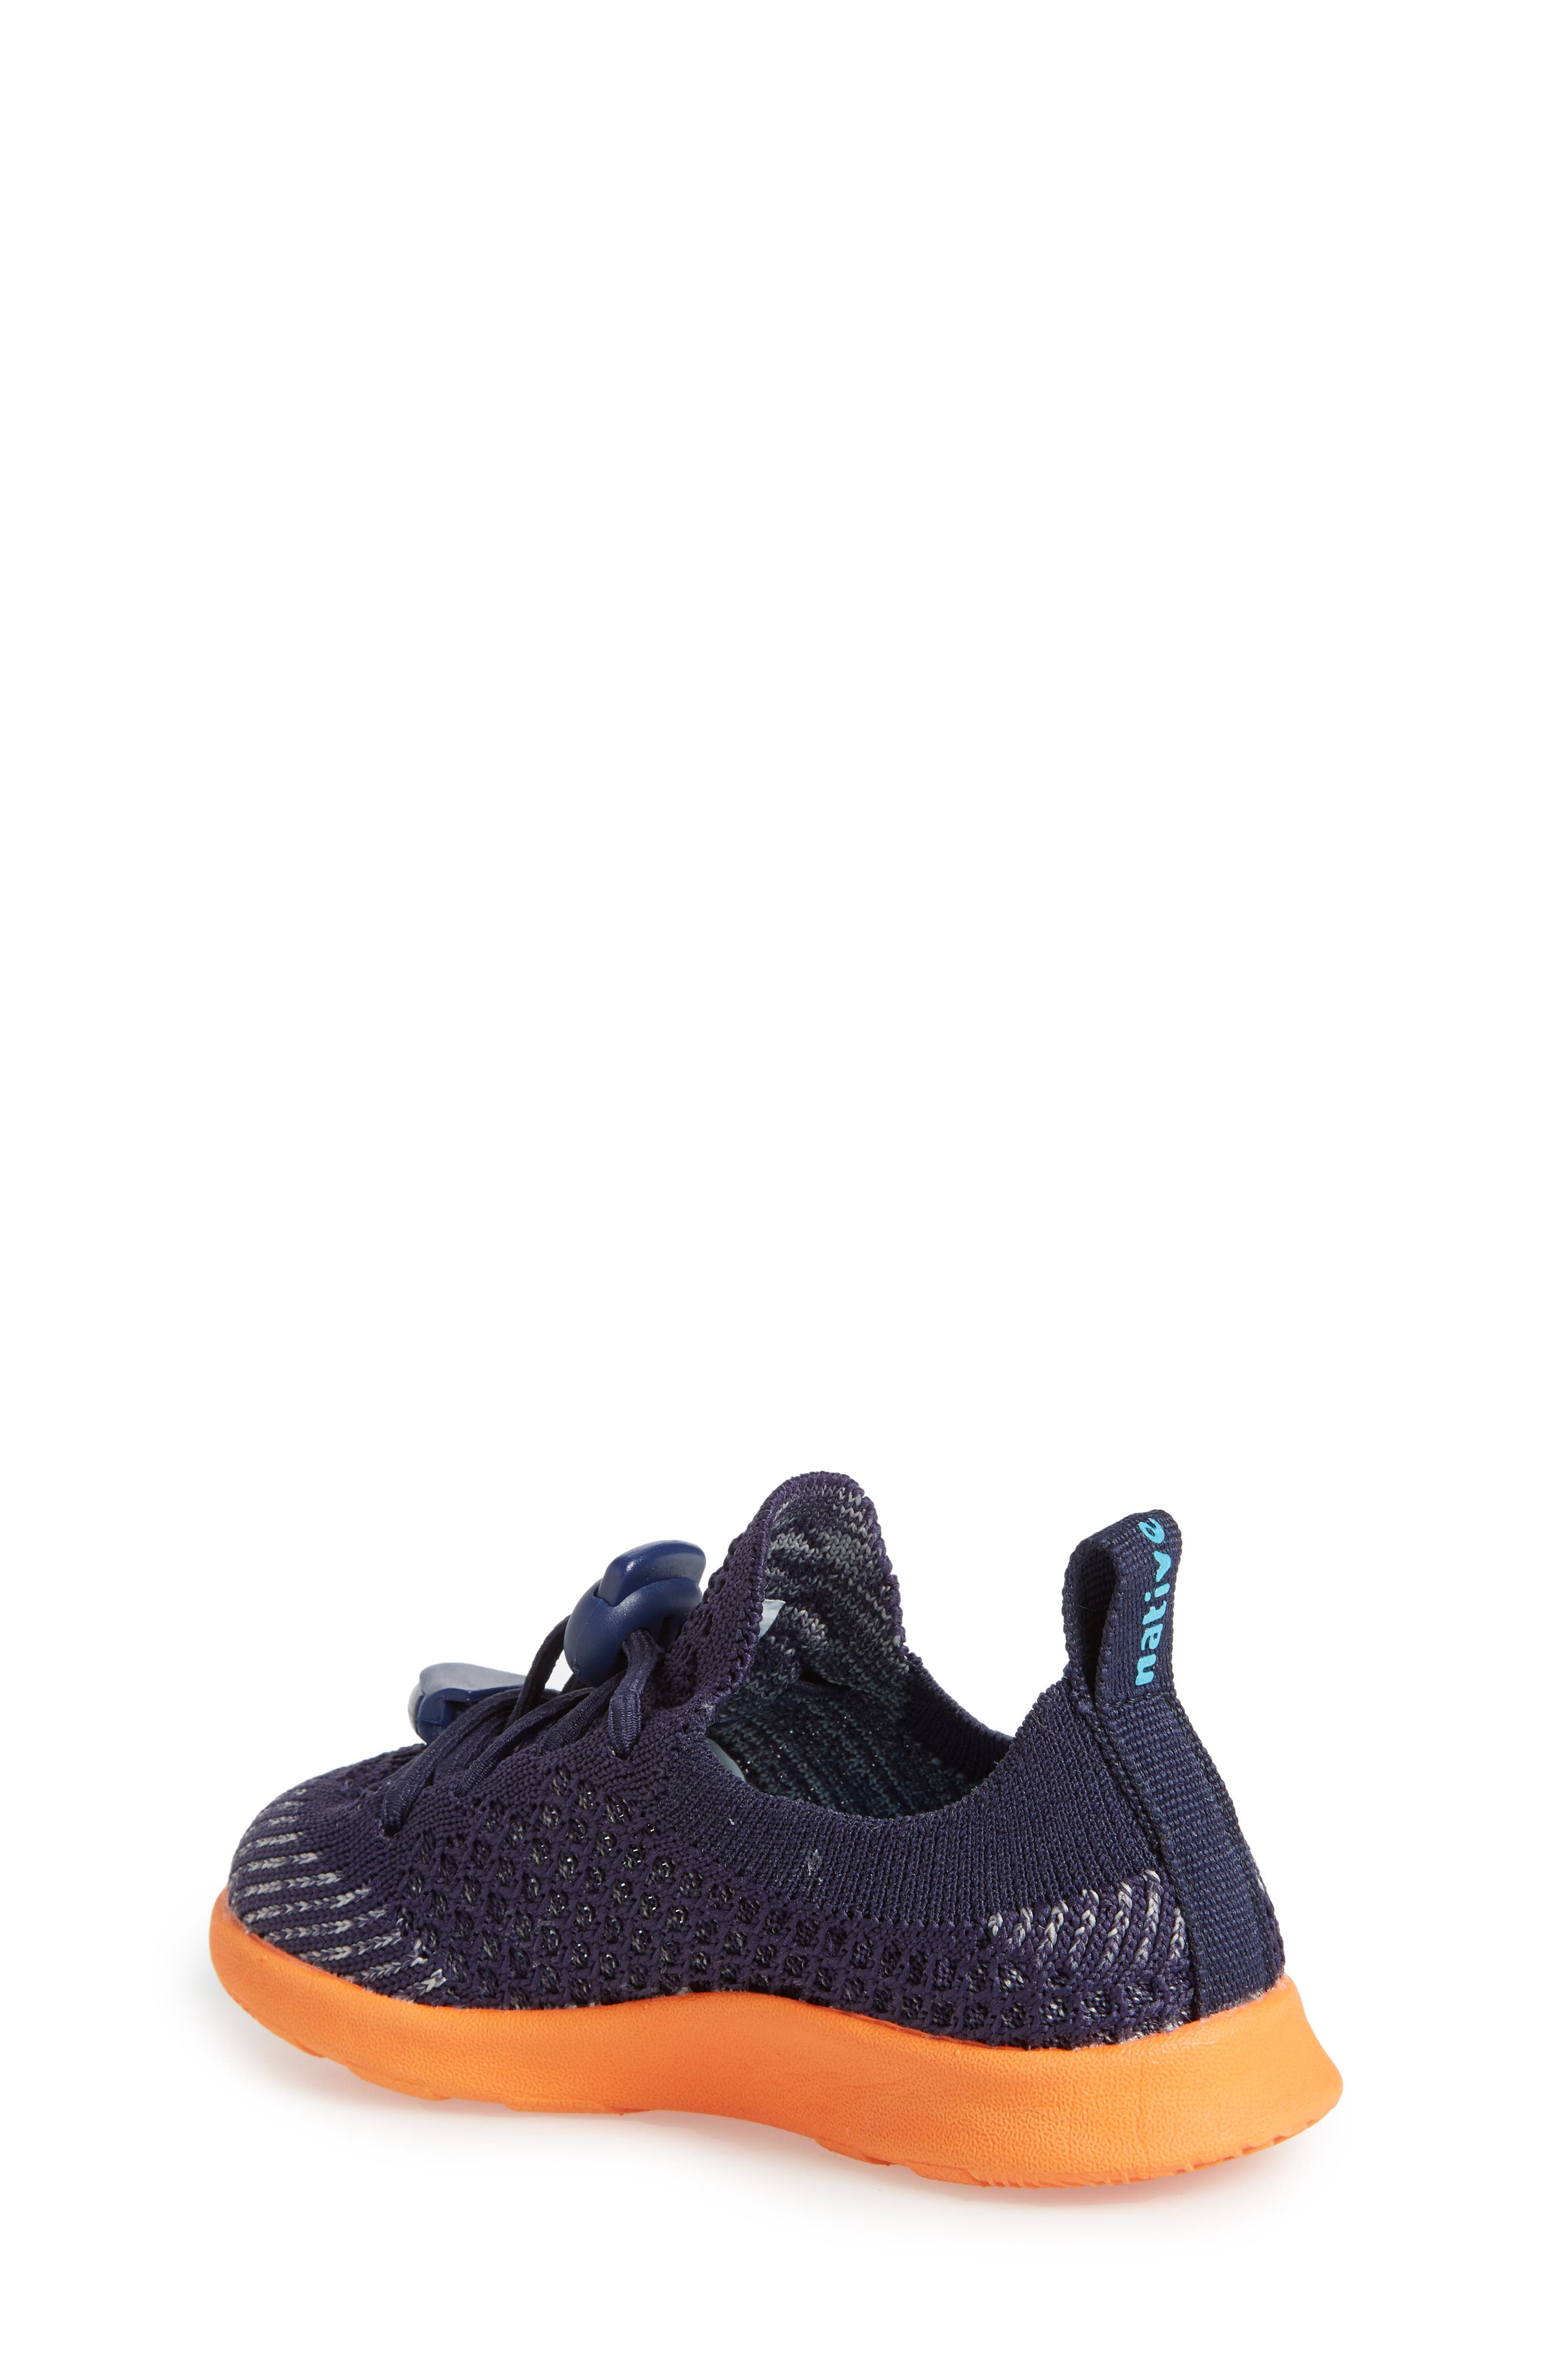 AP Mercury LiteKnit Sneaker,                             Alternate thumbnail 2, color,                             REGATTA BLUE/ SUNSET ORANGE